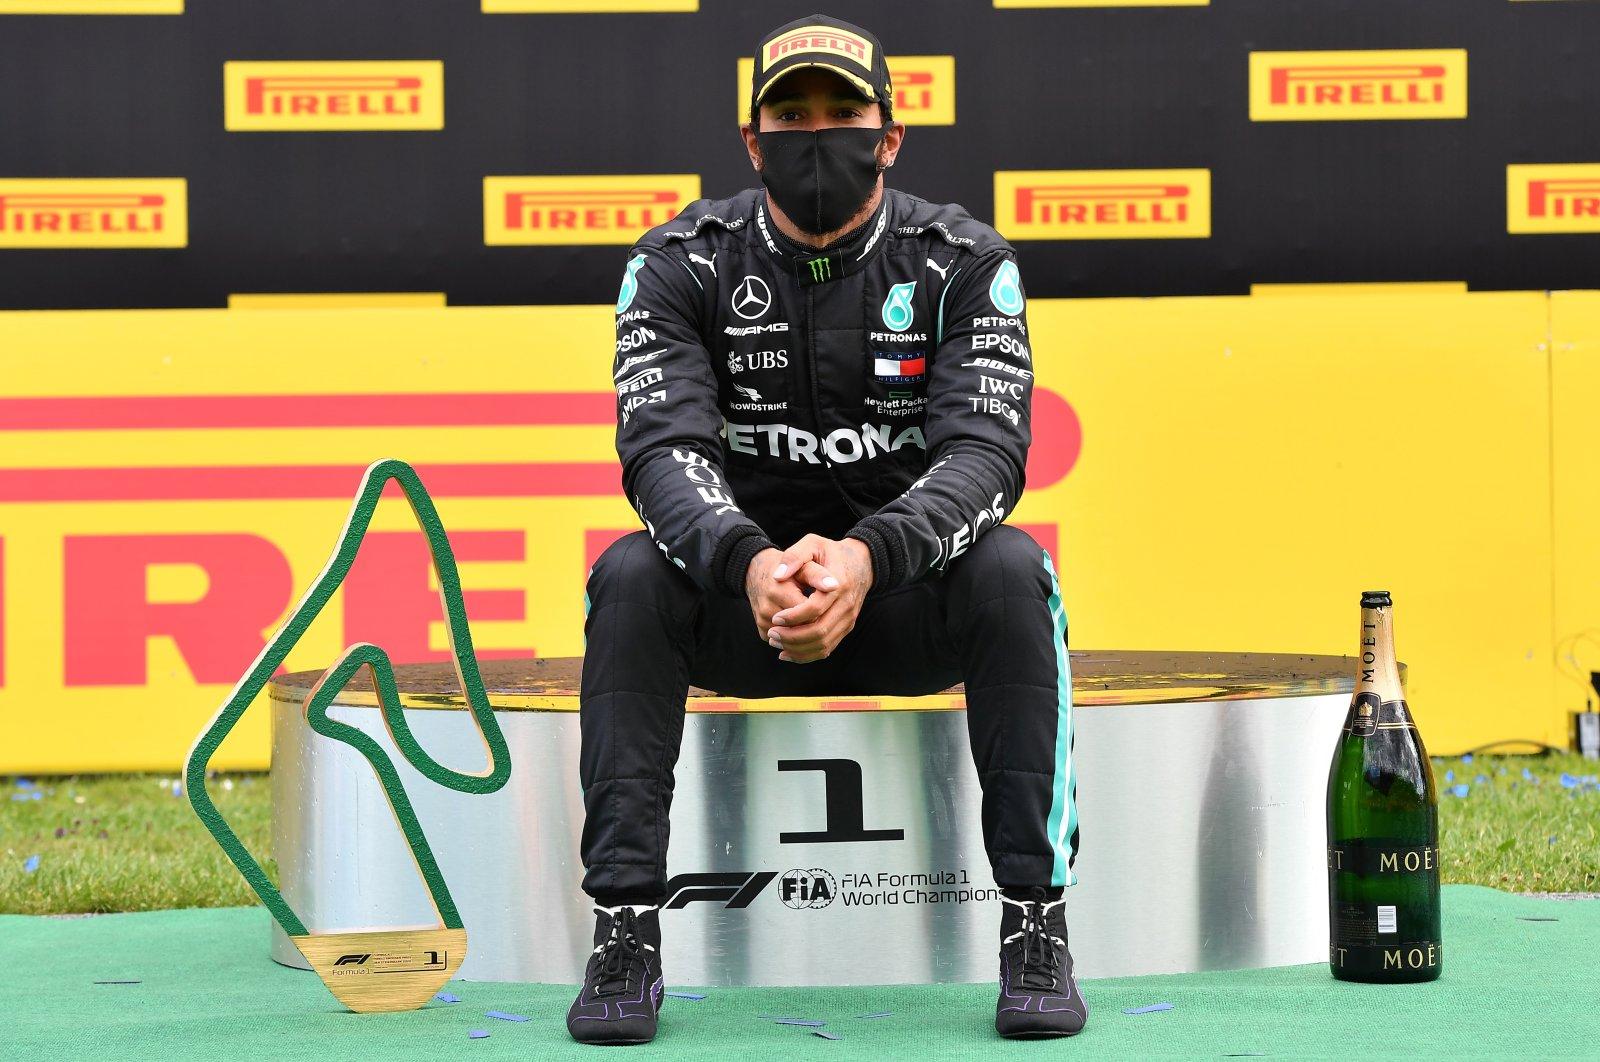 Mercedes' Lewis Hamilton celebrates on the podium after winning the Formula One Styria GP in Spielberg, Austria, July 12, 2020. (EPA Photo)